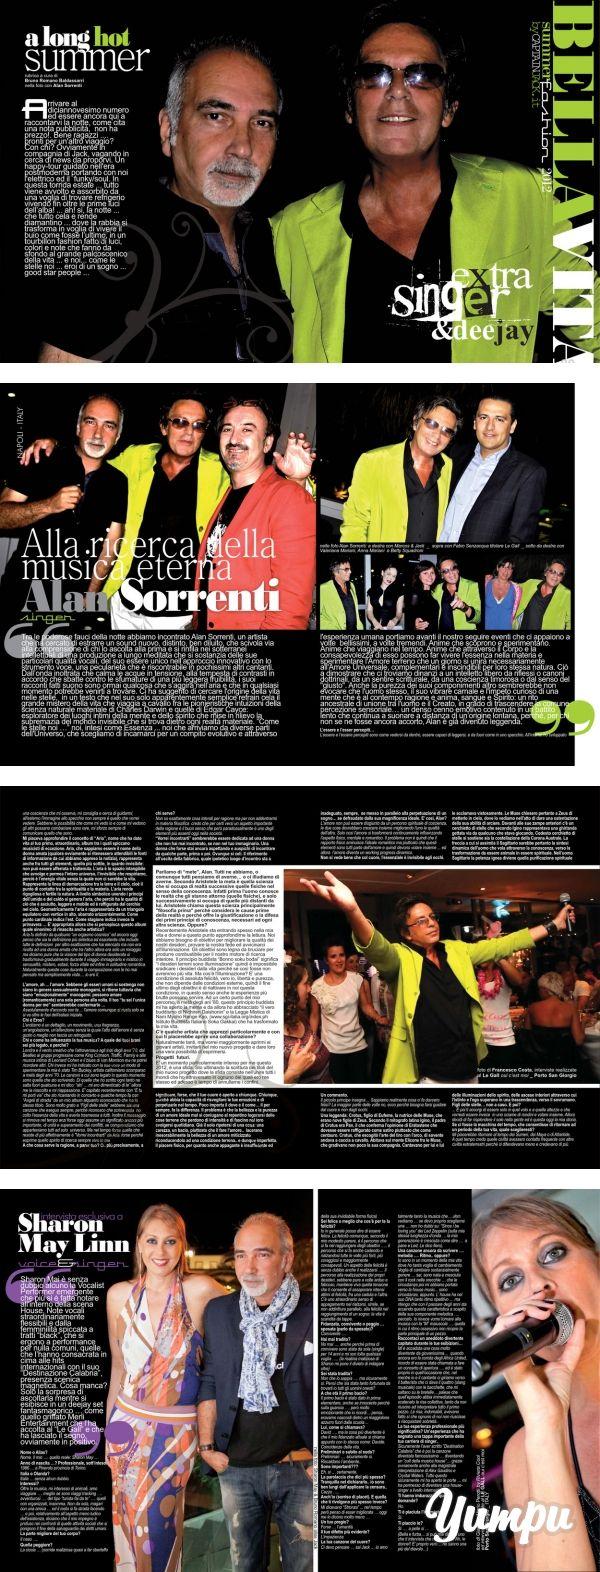 http://www.donnaimpresa.com bella vita 1.cdr - Donna Impresa Magazine - Magazine with 11 pages: bella vita 1.cdr - Donna Impresa Magazine